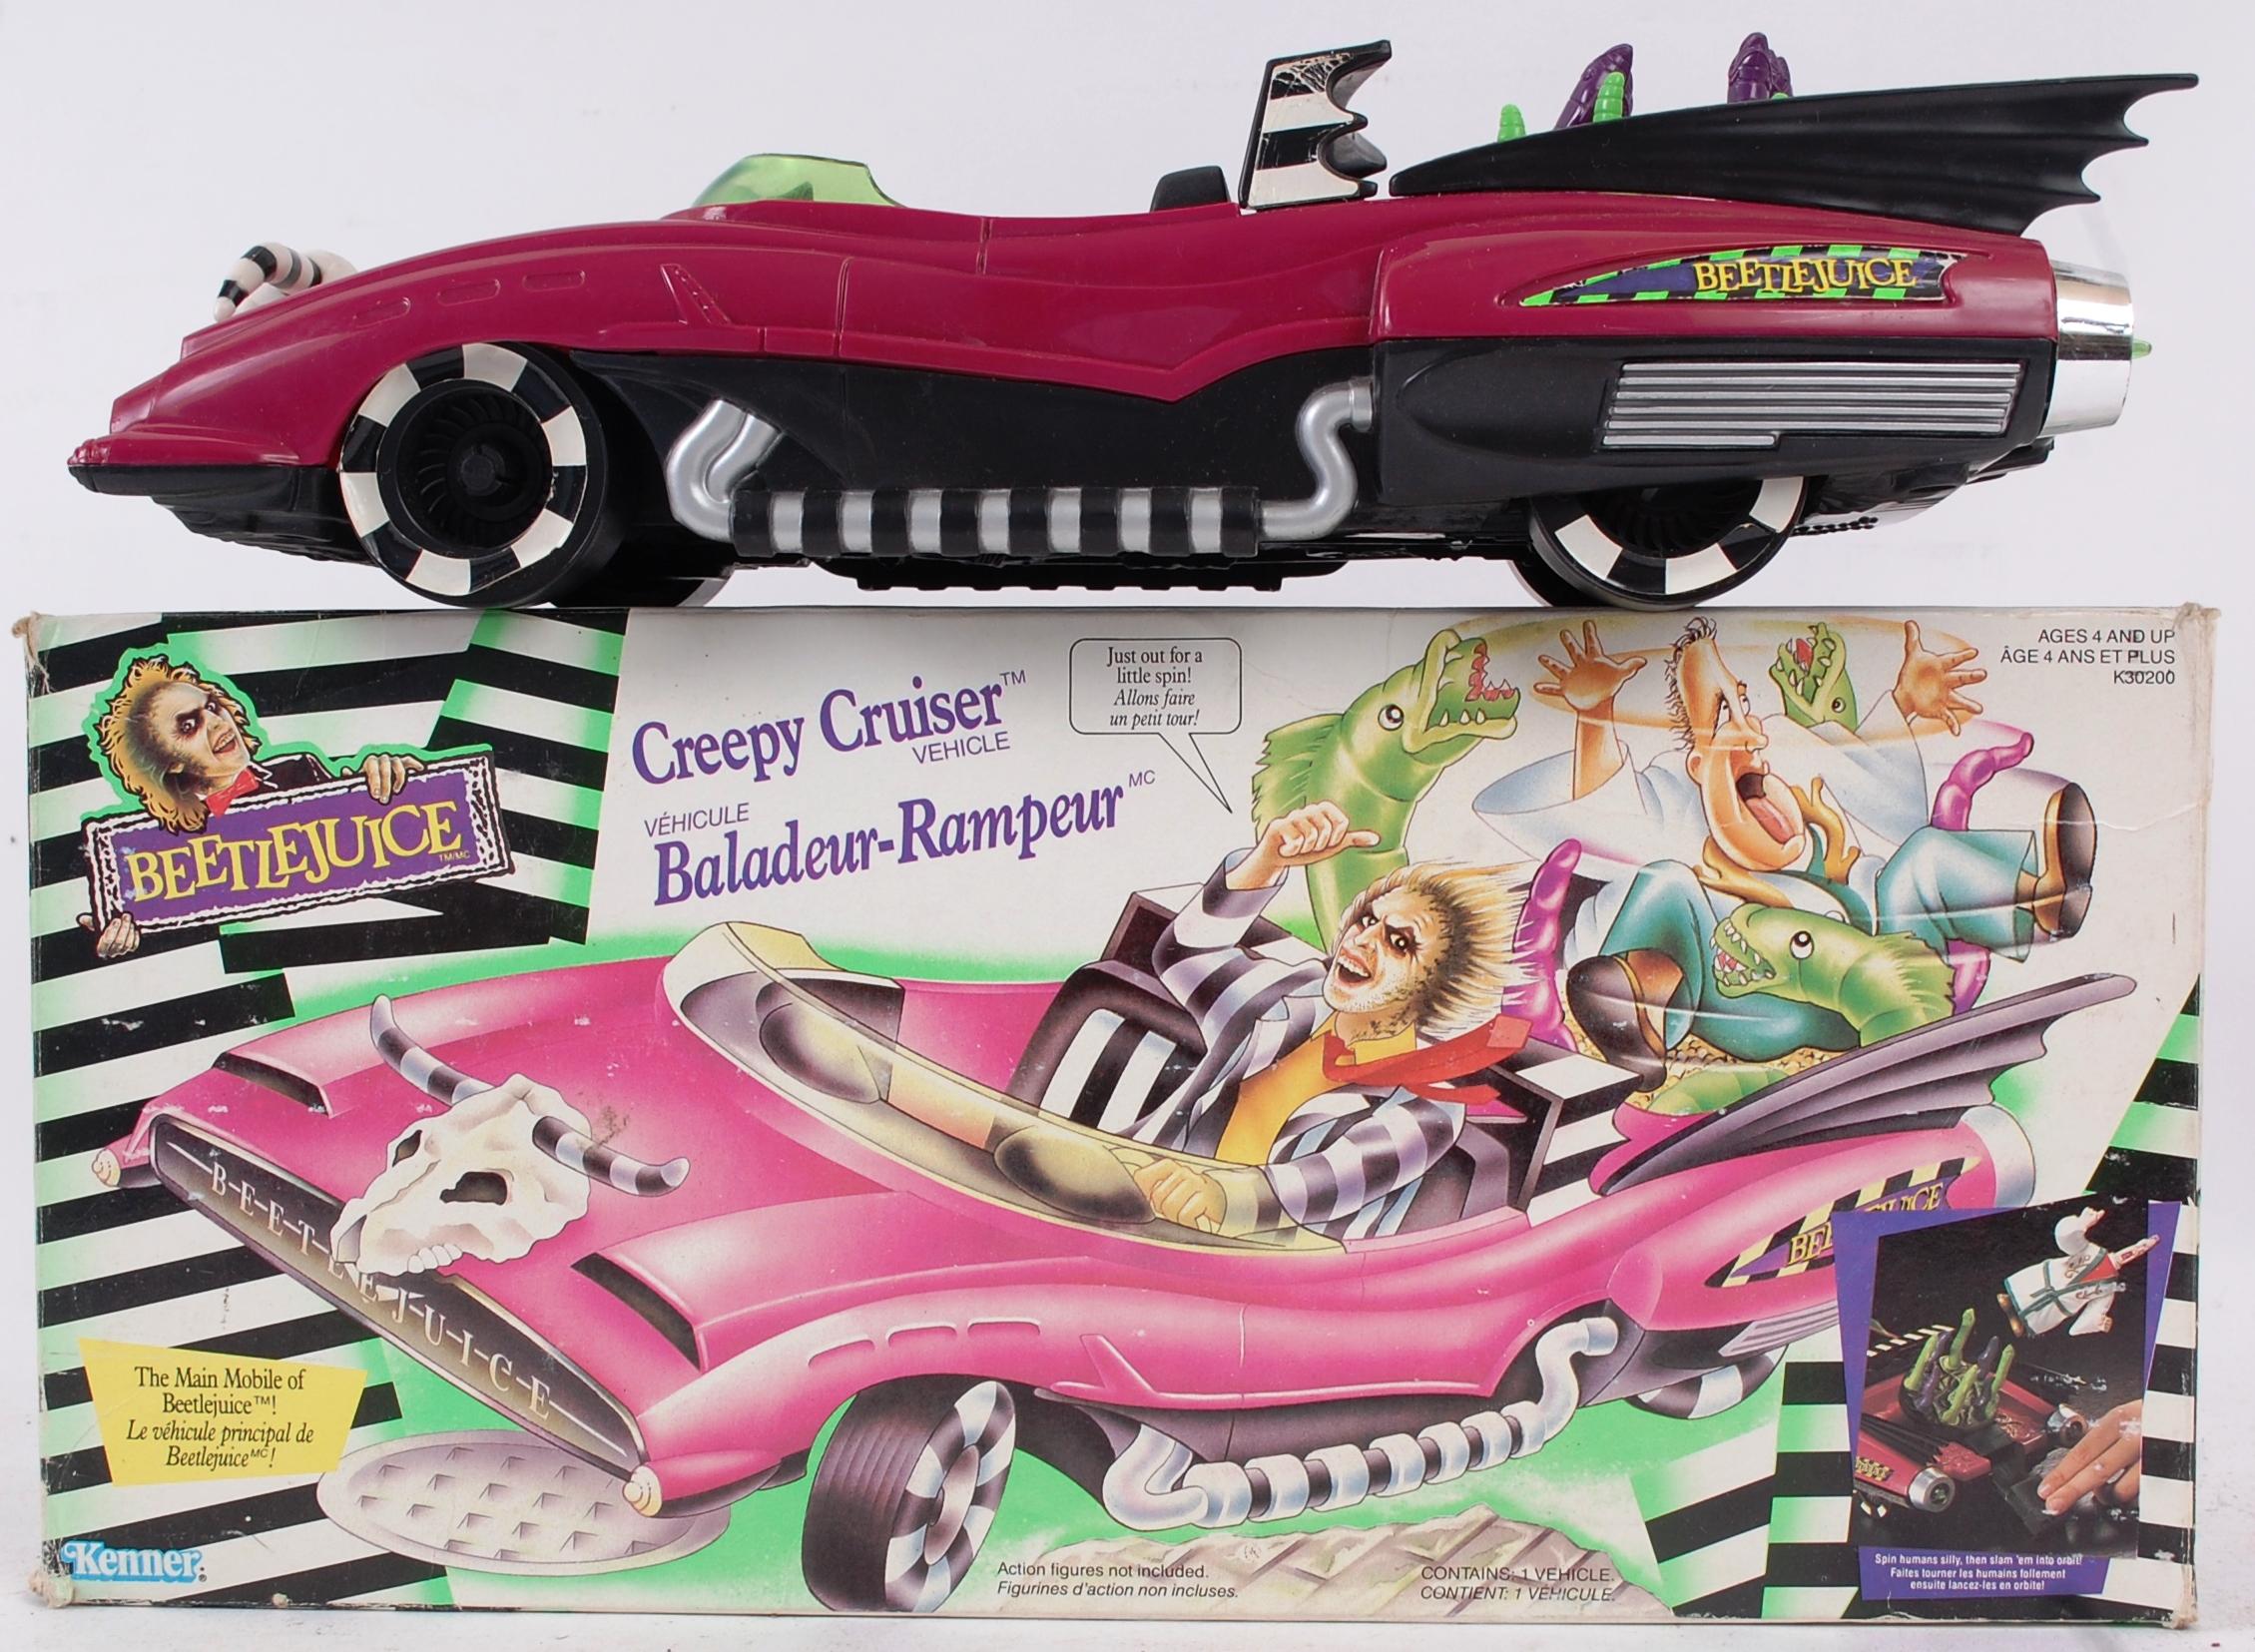 BEETLEJUICE An original Kenner Beetlejuice Creepy Cruiser vehicle